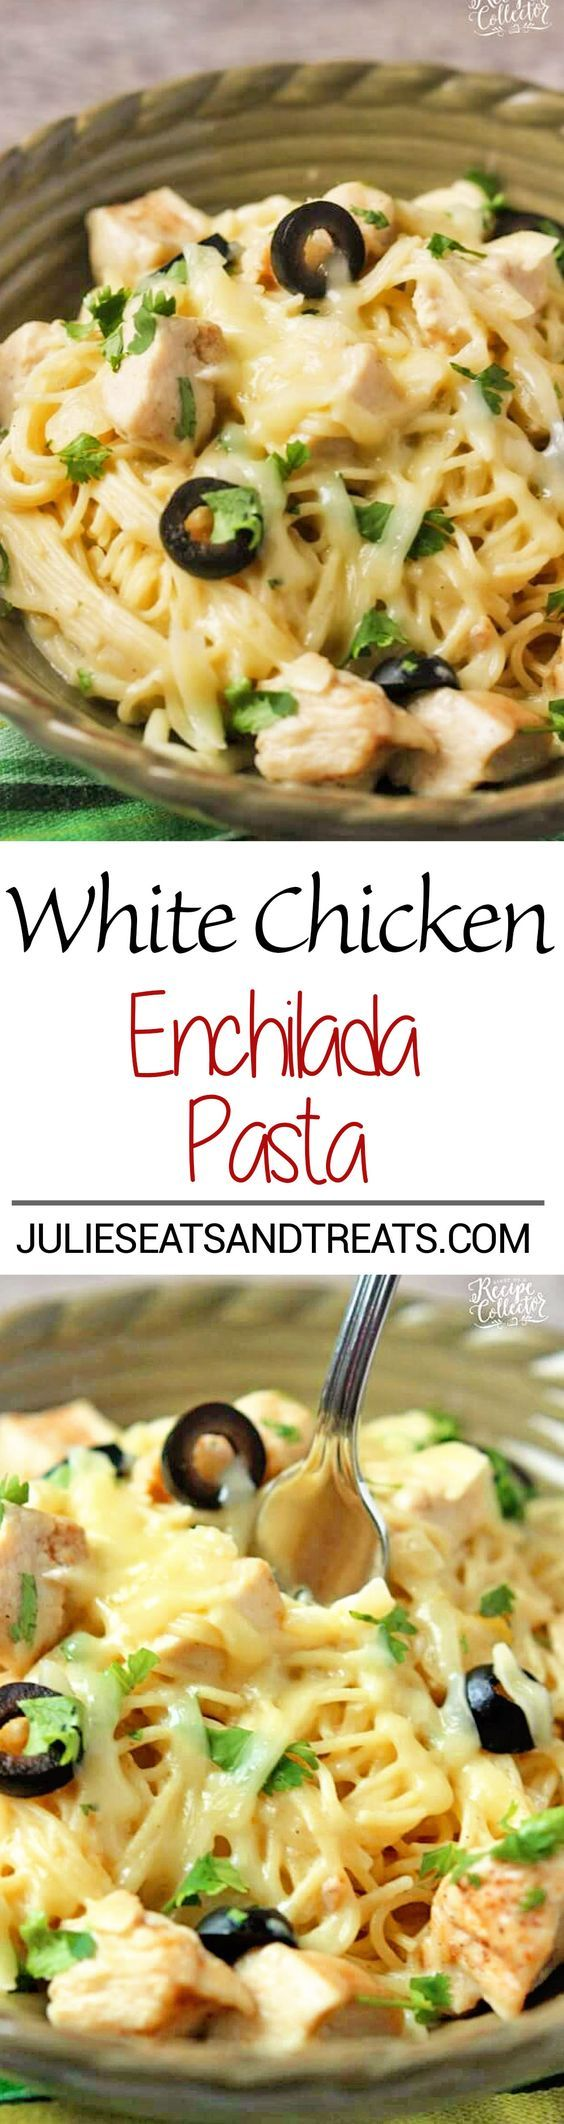 White Chicken Enchilada Pasta